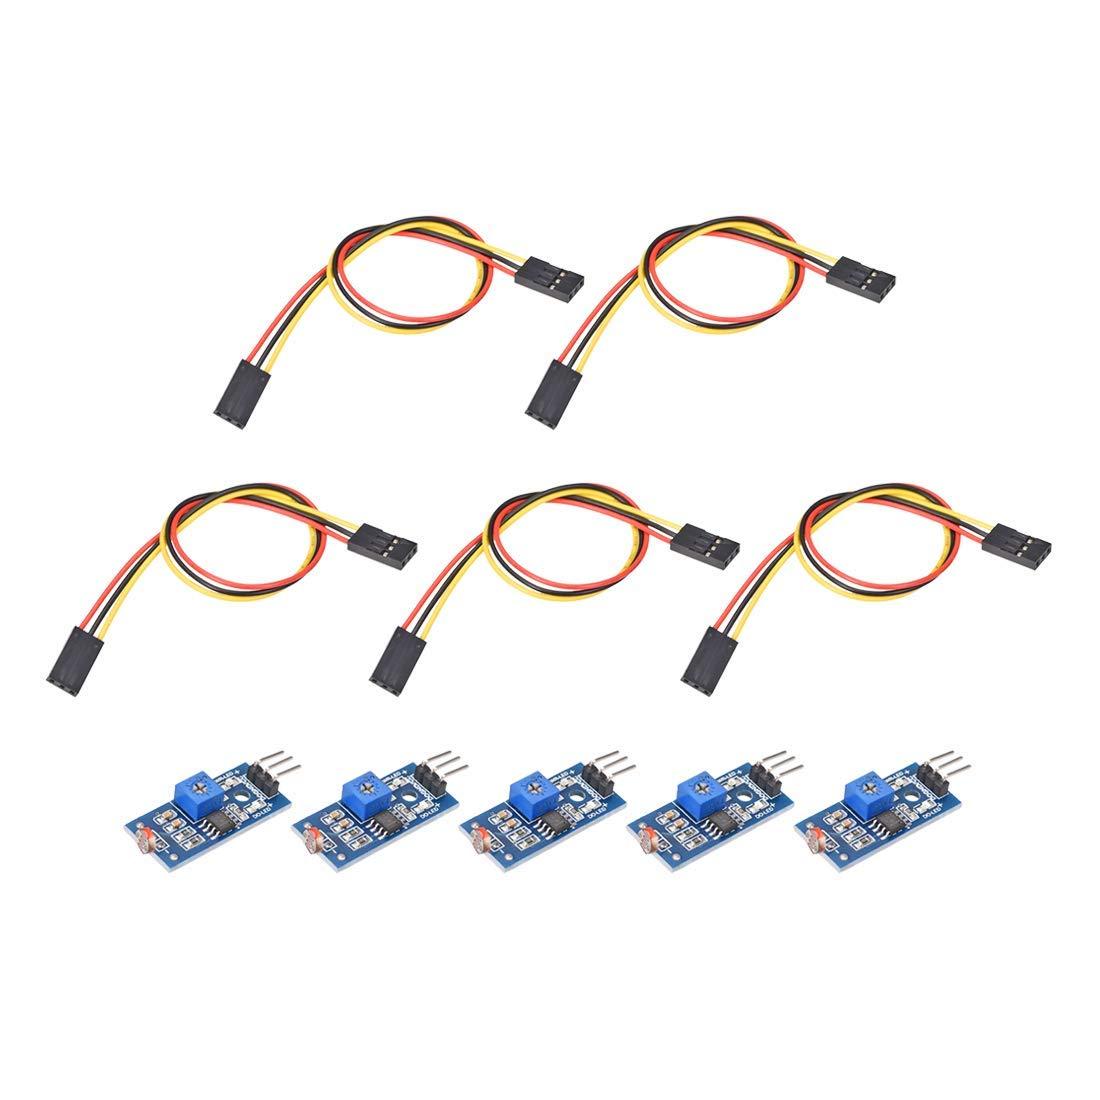 photosensitive Sensor Module Digital Light Intensity Detection with 3P DC 3.3-5V Jumper Cable for Arduino UNO 5pcs